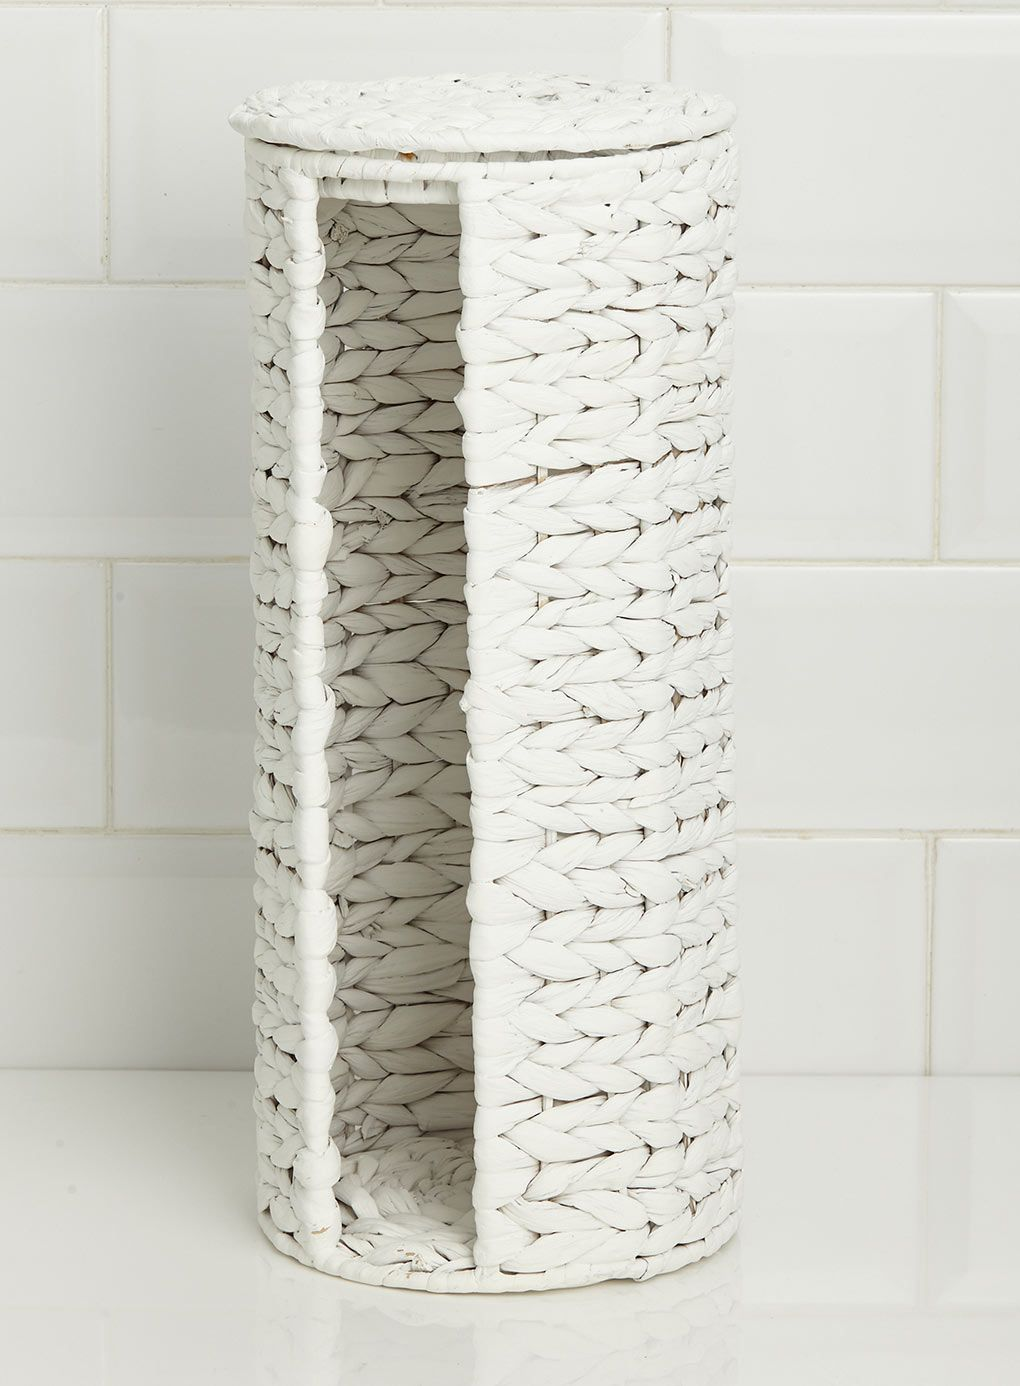 Bhs Bathroom Storage White Waterhyacinth Toilet Roll Holder Alb10 Home Bathroom